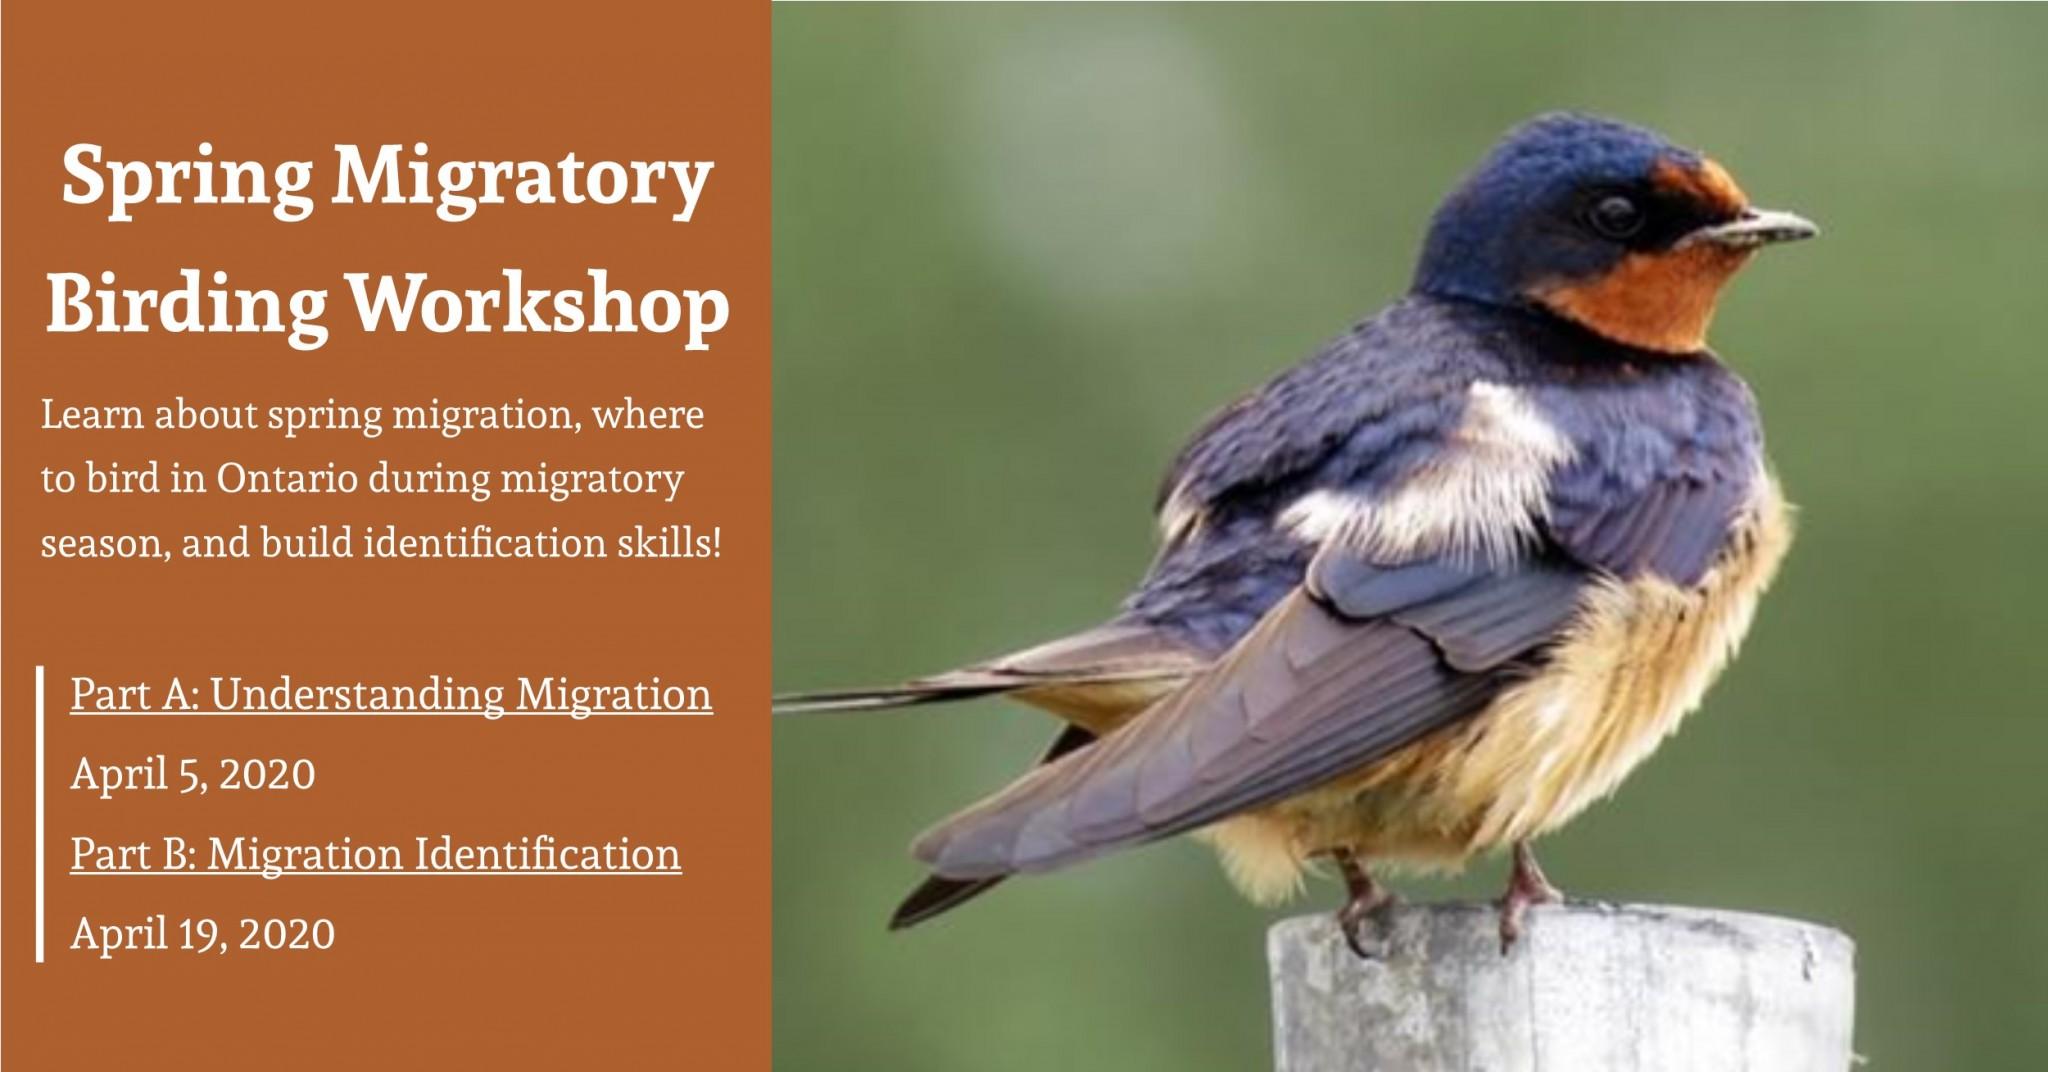 Spring Migratory Birding Workshop FB Cover Event Cal Image 1 - SPRING MIGRATORY BIRDING WORKSHOPS AT WYE MARSH - PART B